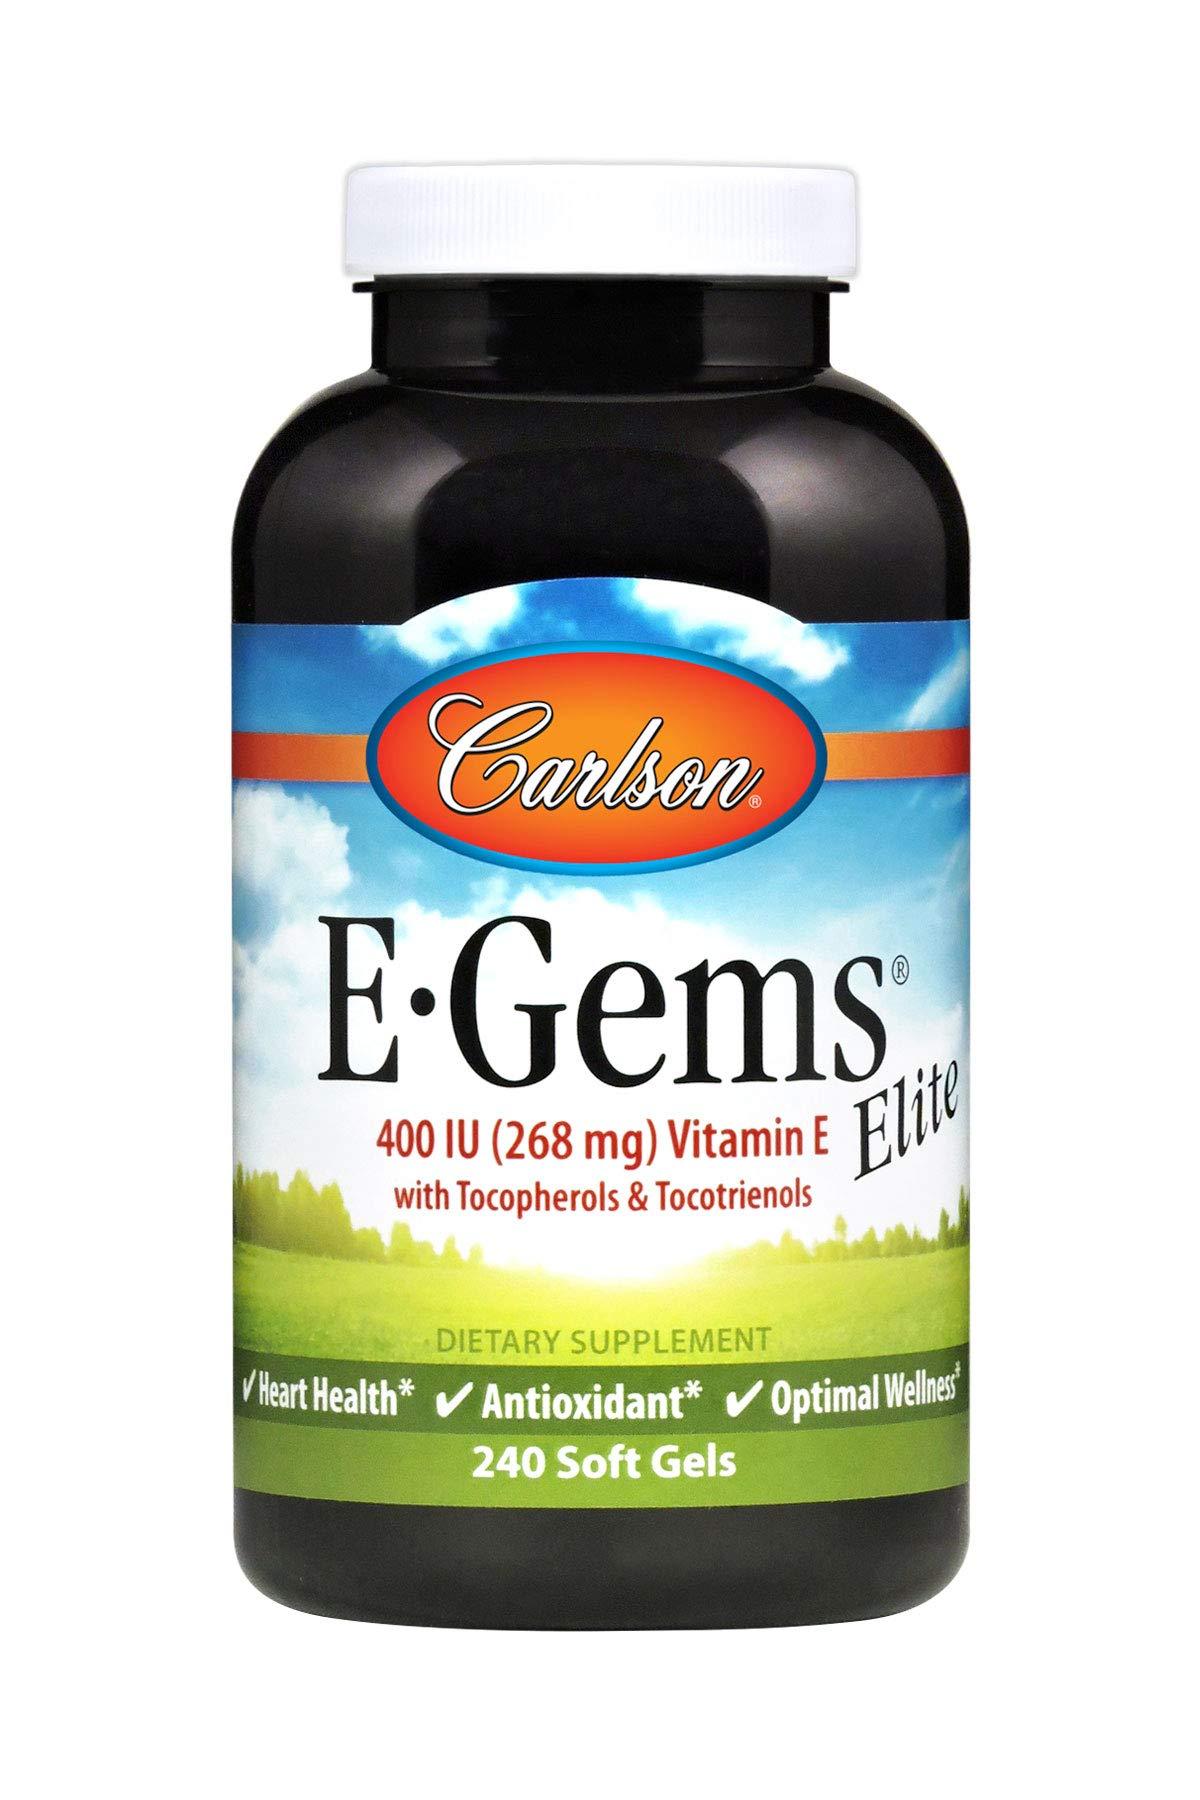 Carlson - E-Gems Elite, 400 IU Vitamin E with Tocopherols & Tocotrienols, Heart Health & Optimal Wellness, Antioxidant, 240 soft gels by Carlson